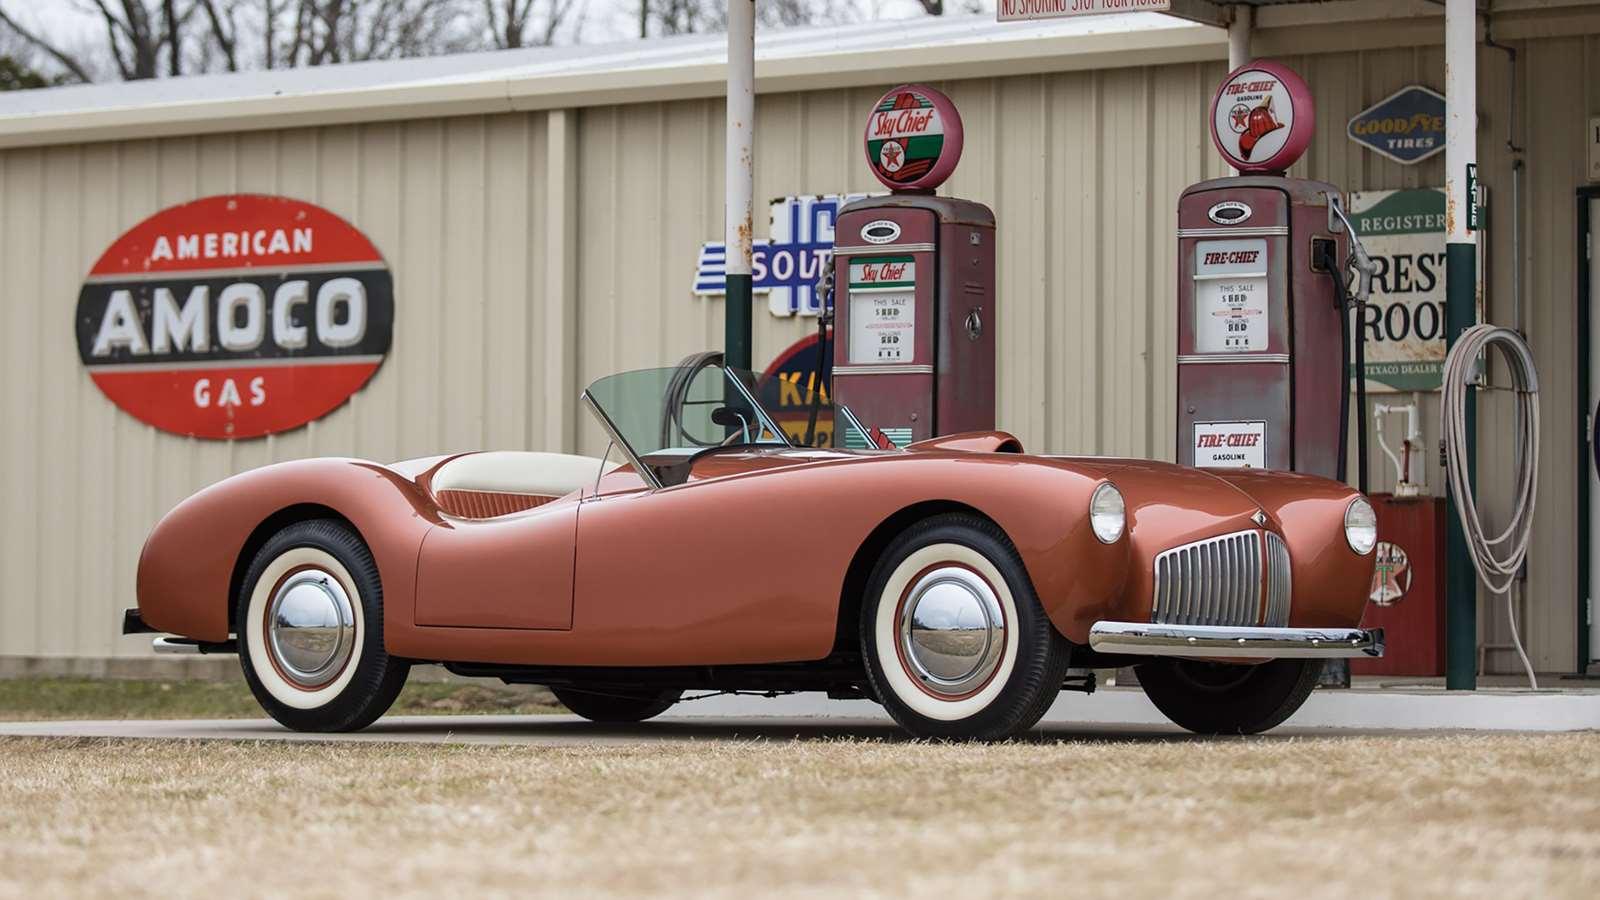 Plastic fantastic – 70 years of fiberglass cars!